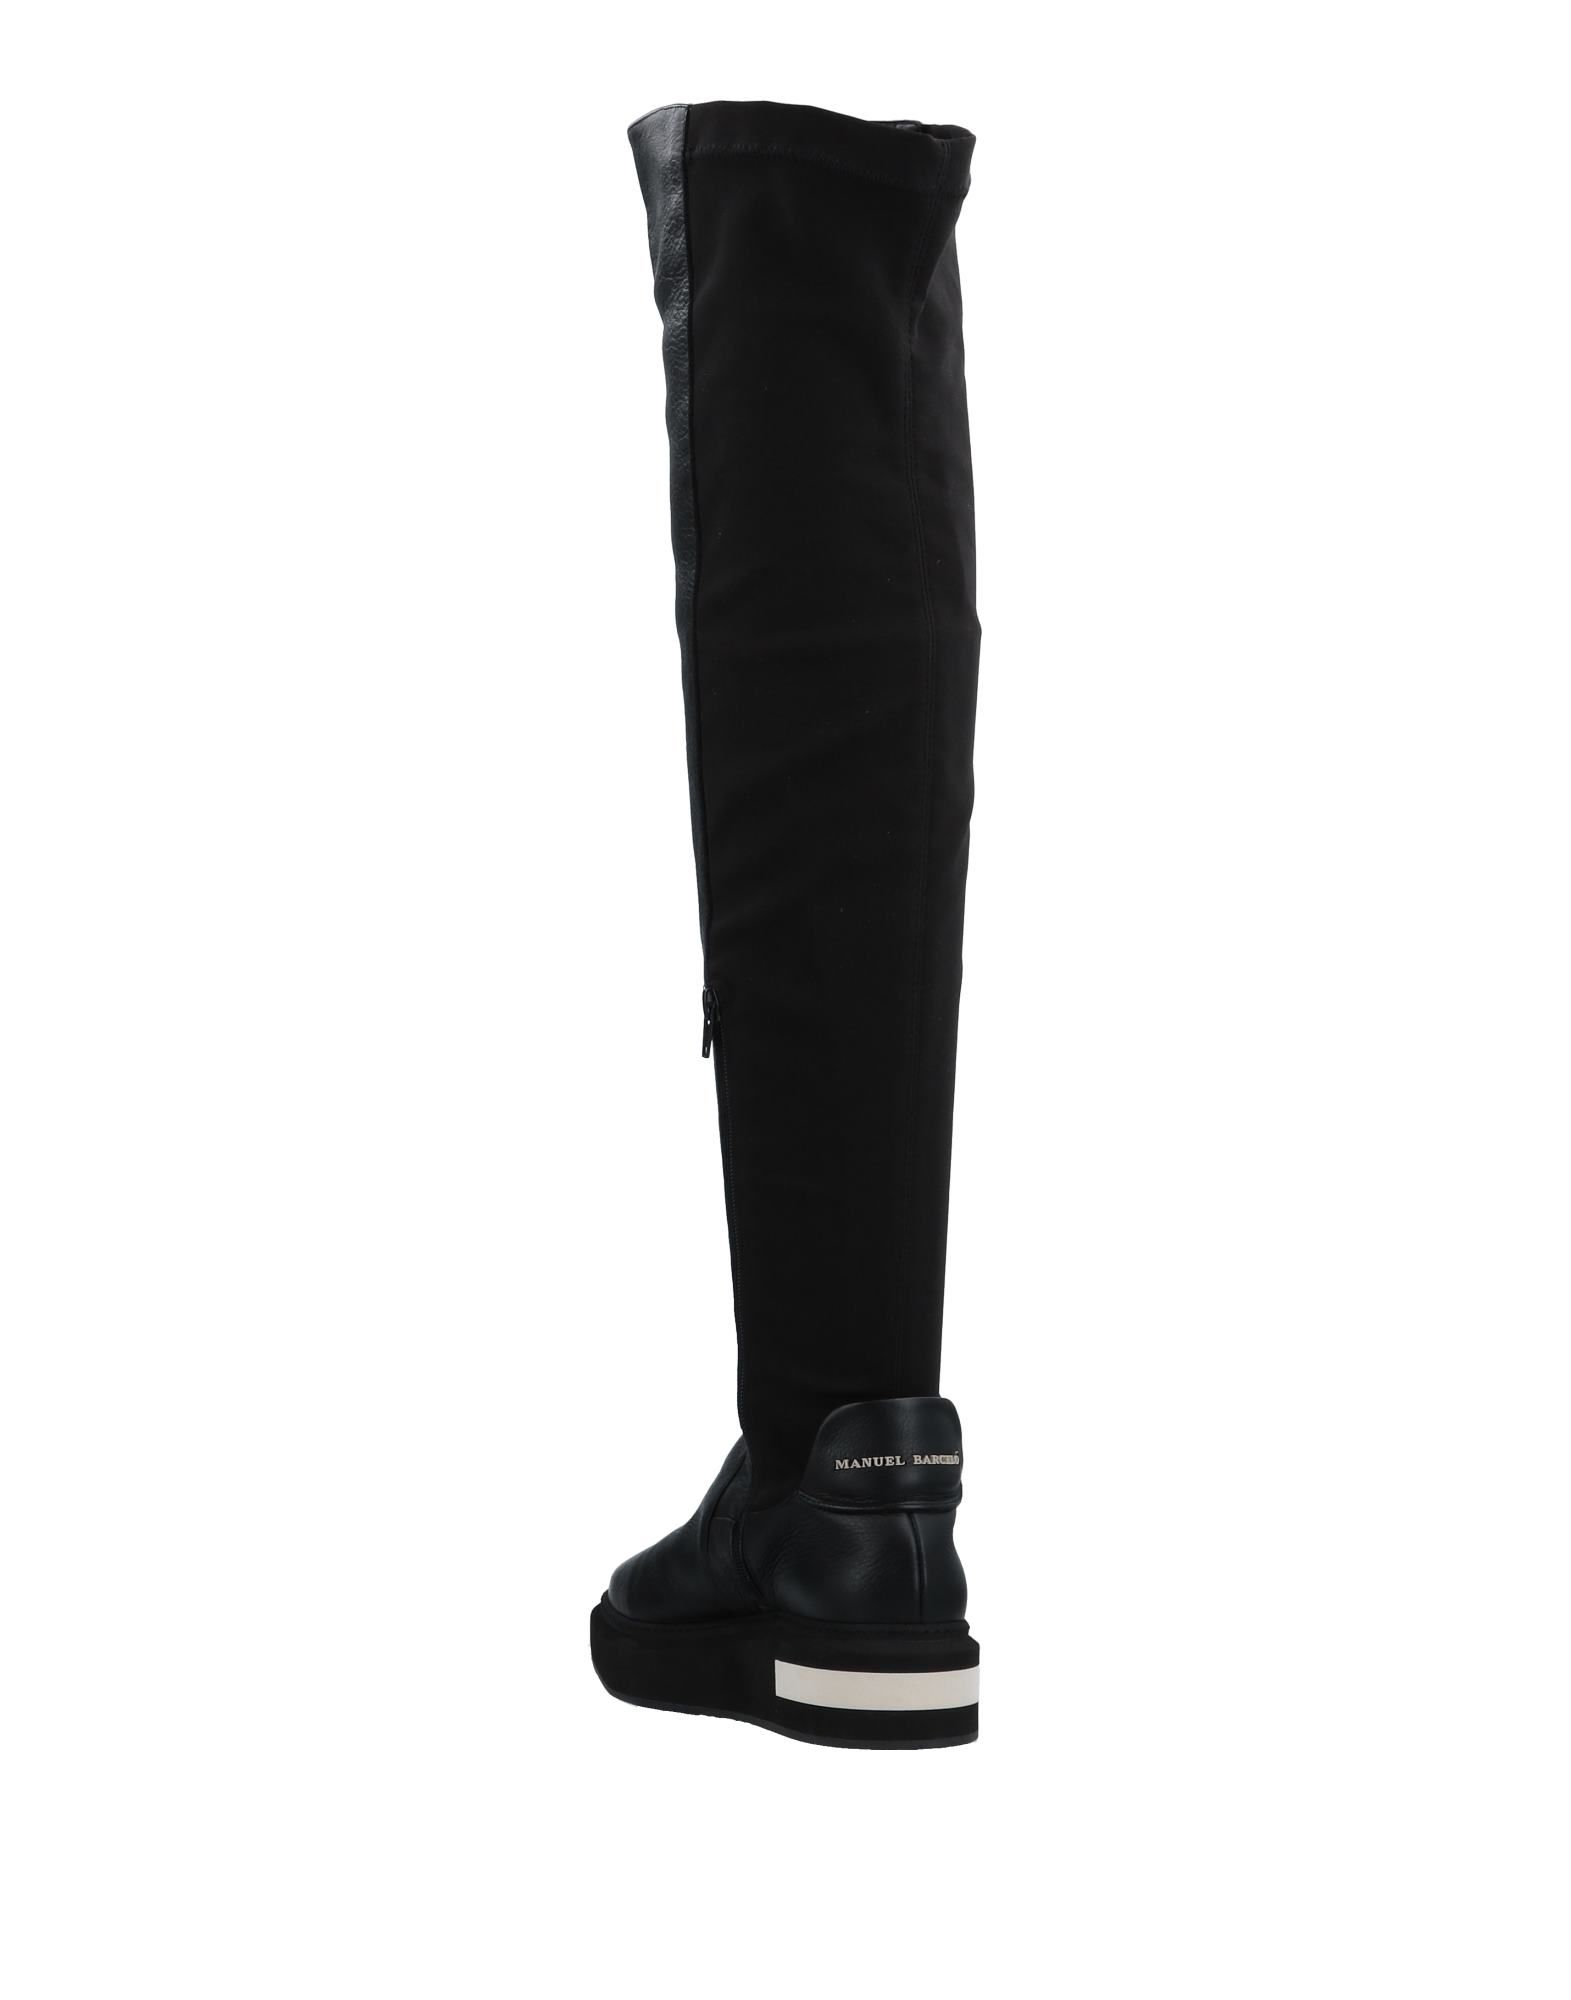 Manuel Barceló Stiefel Damen    11512548WR Neue Schuhe df151b